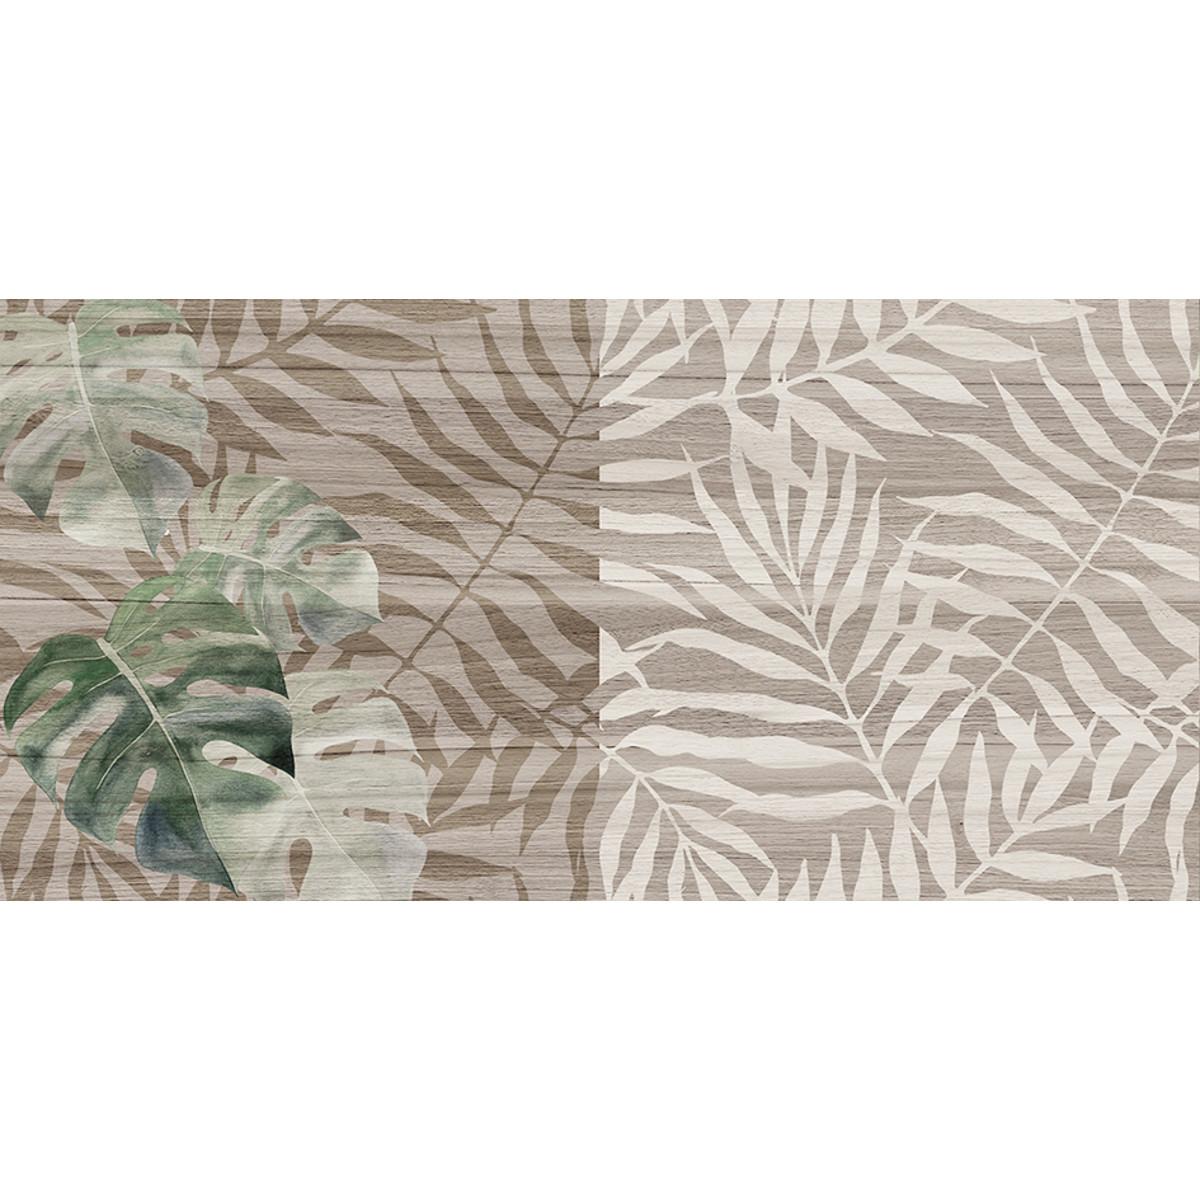 Плитка настенная Organic с узором 20х40 см 1.2 м² цвет серый